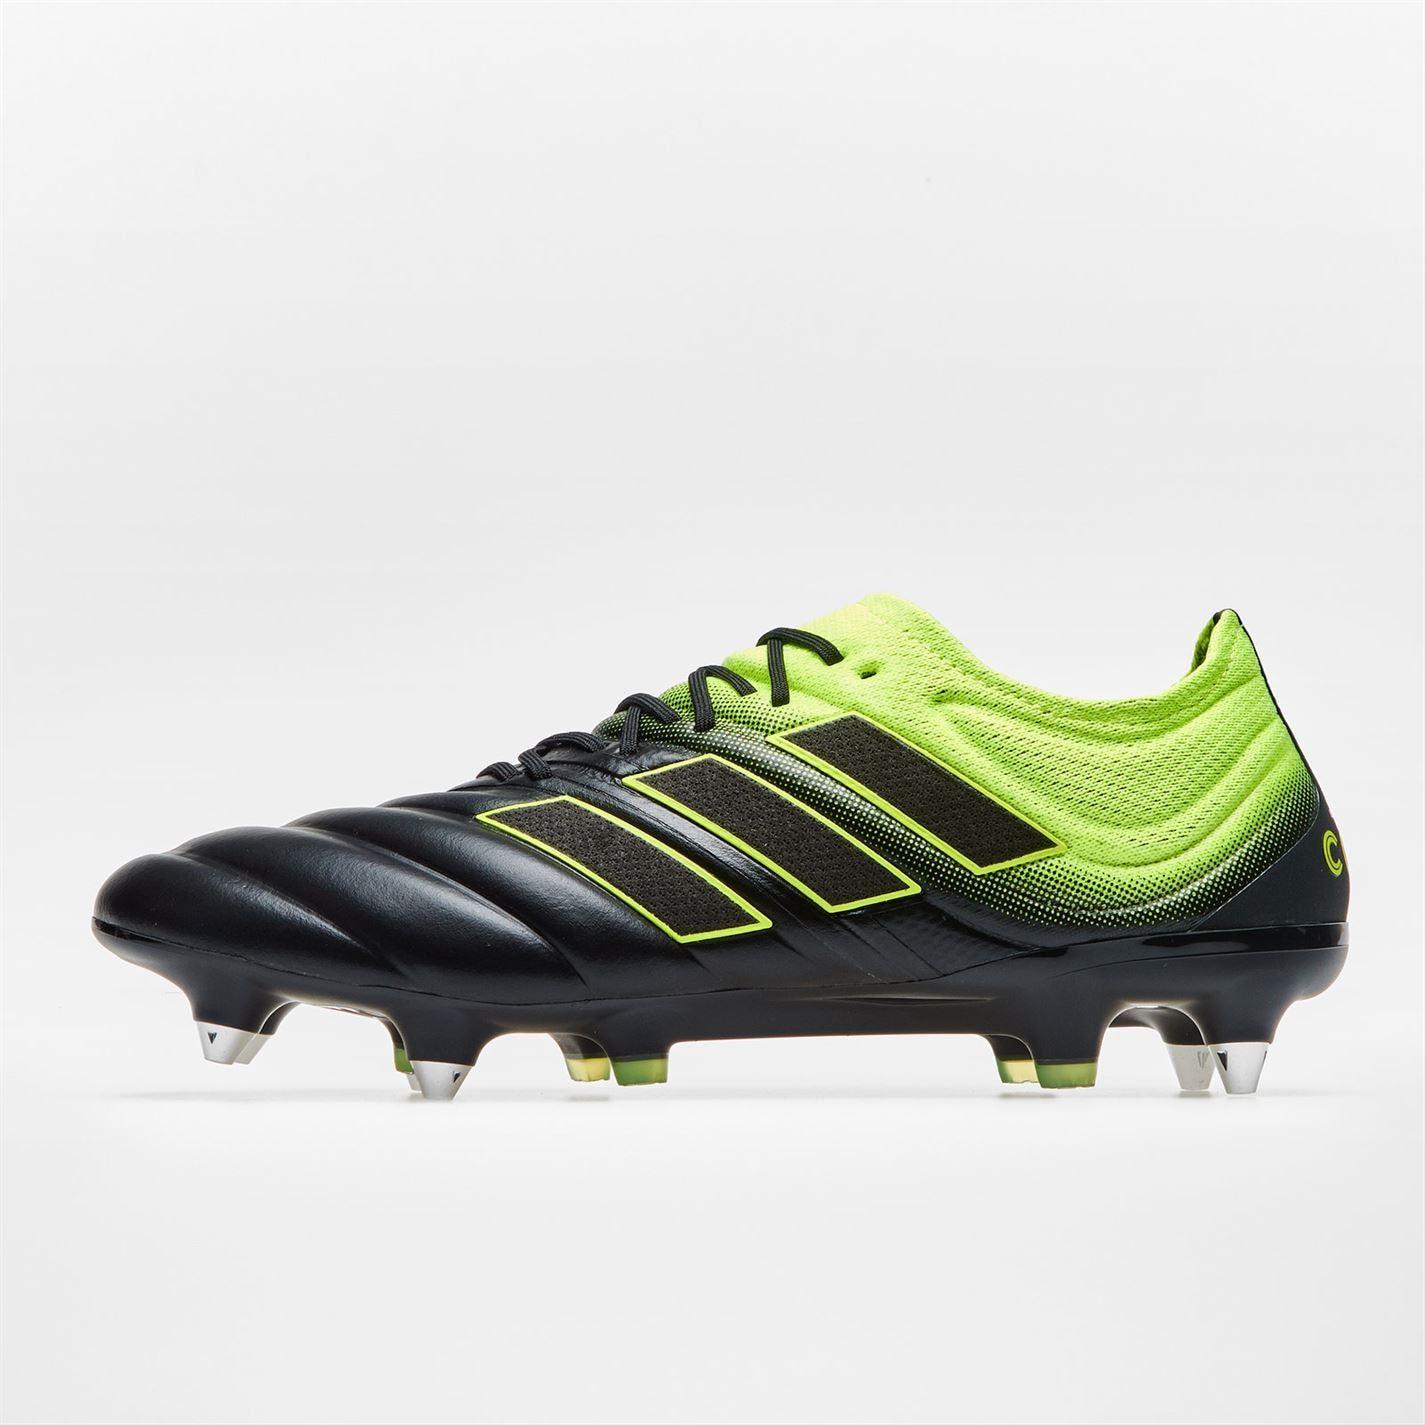 miniature 3 - Adidas-Copa-19-1-Homme-pignon-fixe-Terre-Ferme-Chaussures-De-Football-Chaussures-de-Foot-Crampons